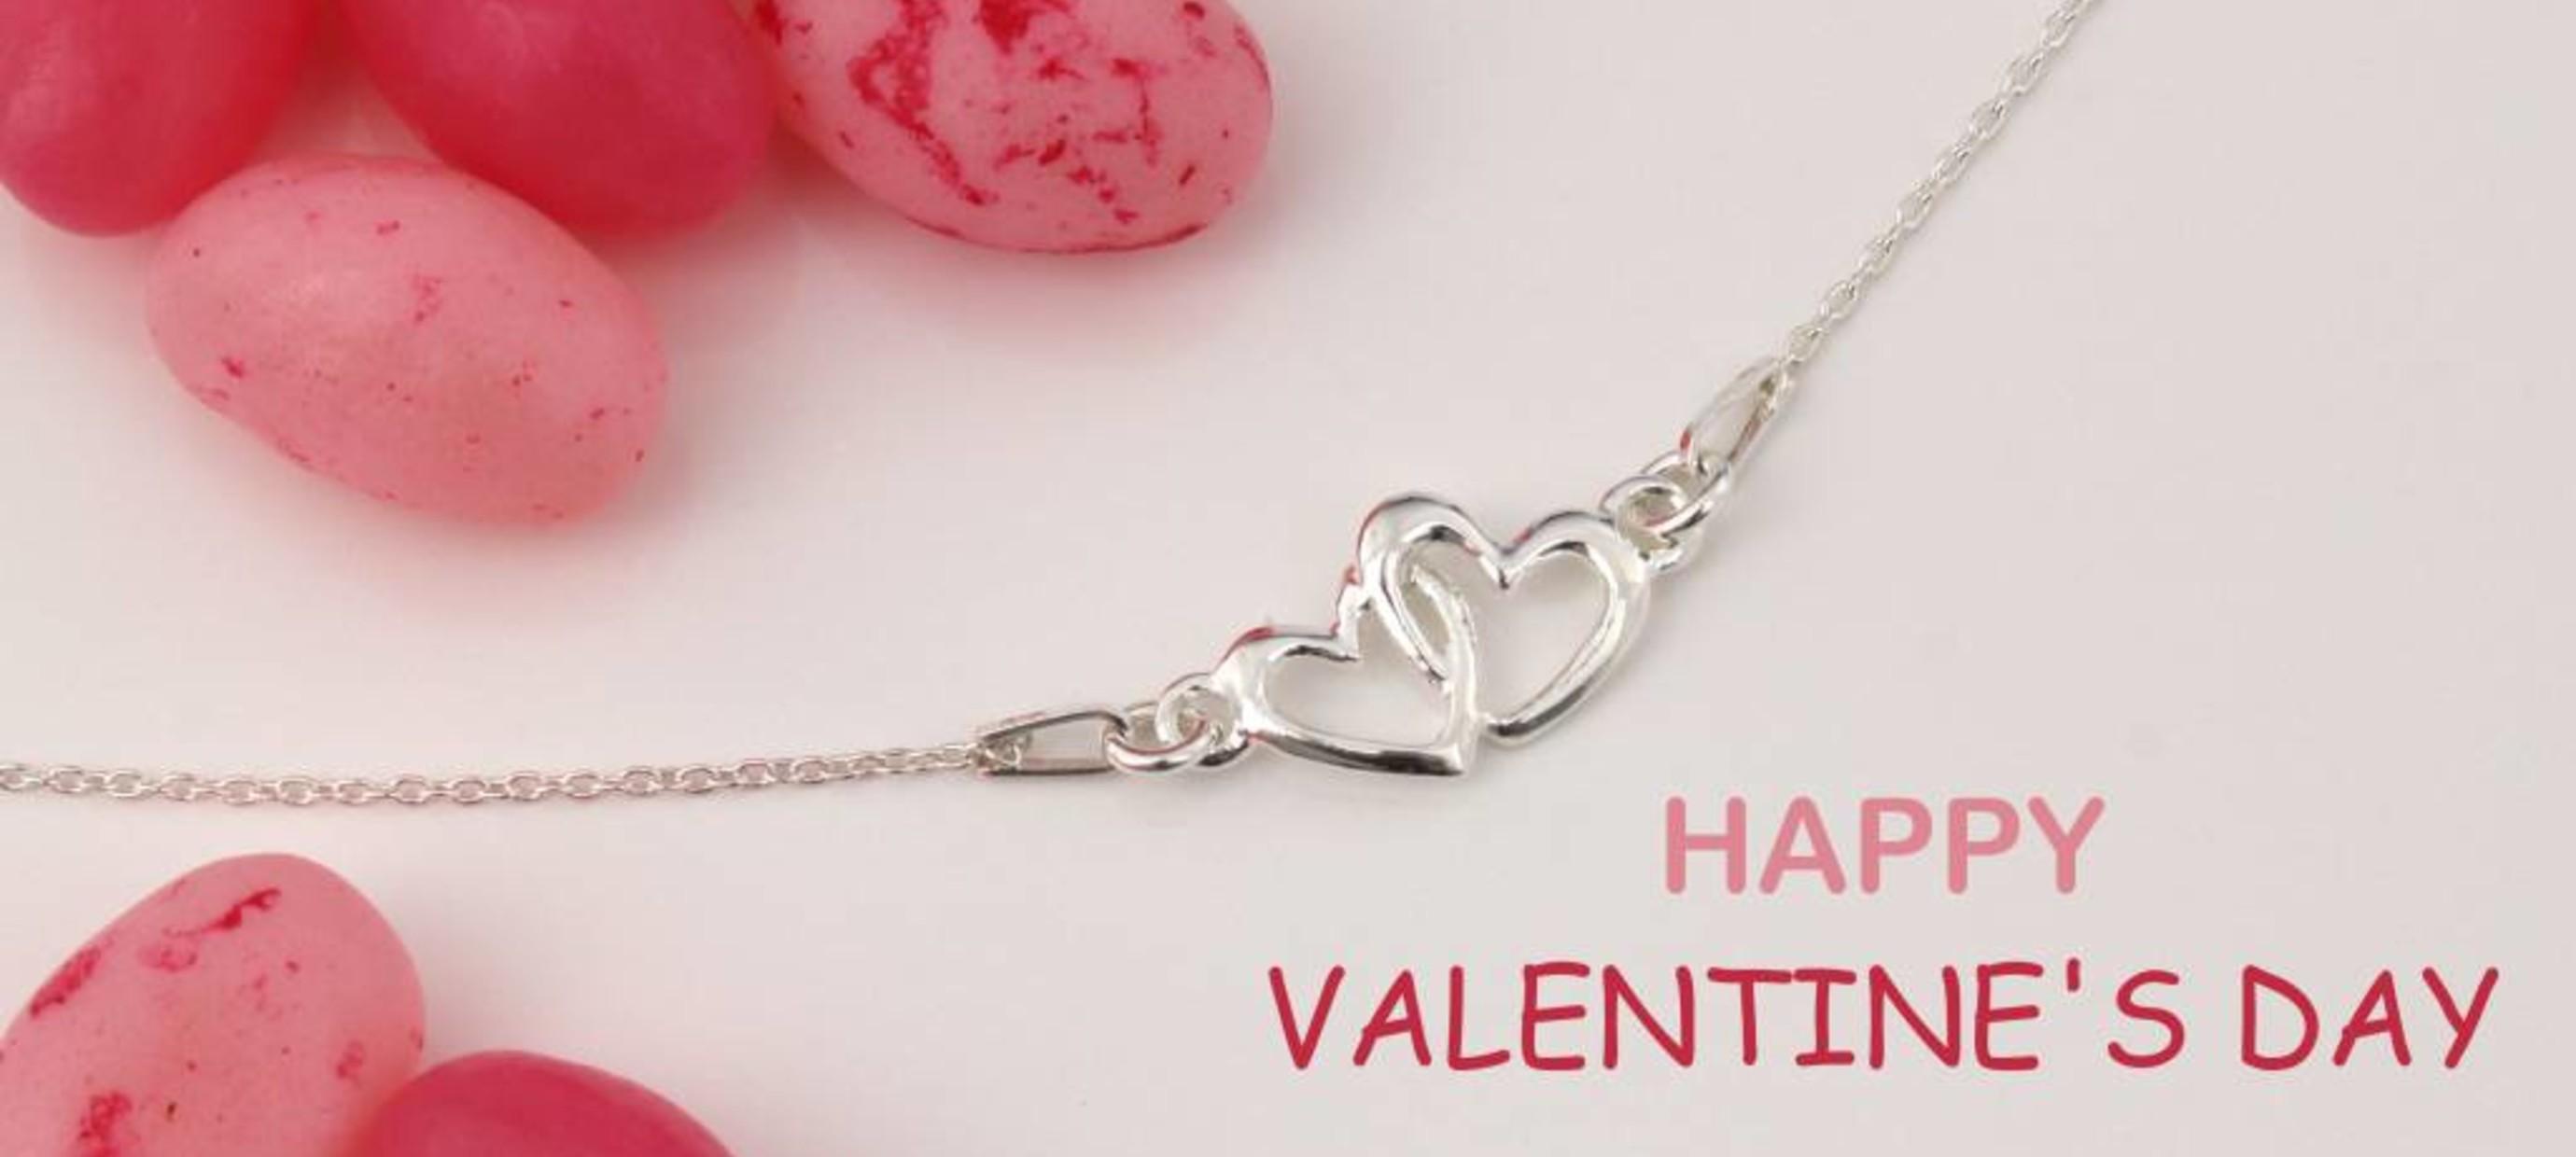 Jewelry for Valentine's Day?